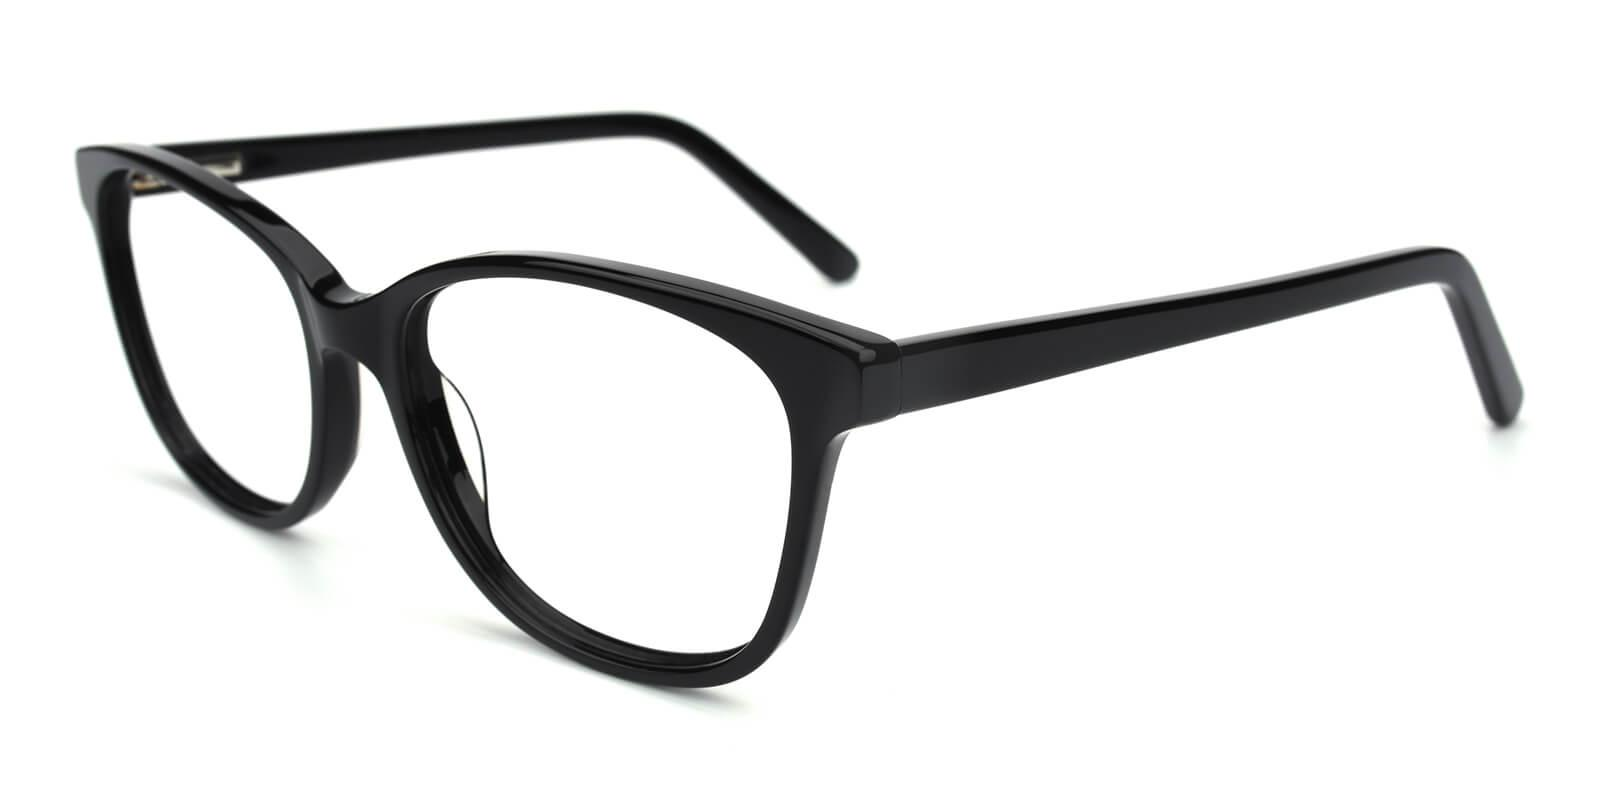 Bolivia-Black-Cat-Acetate-Eyeglasses-additional1